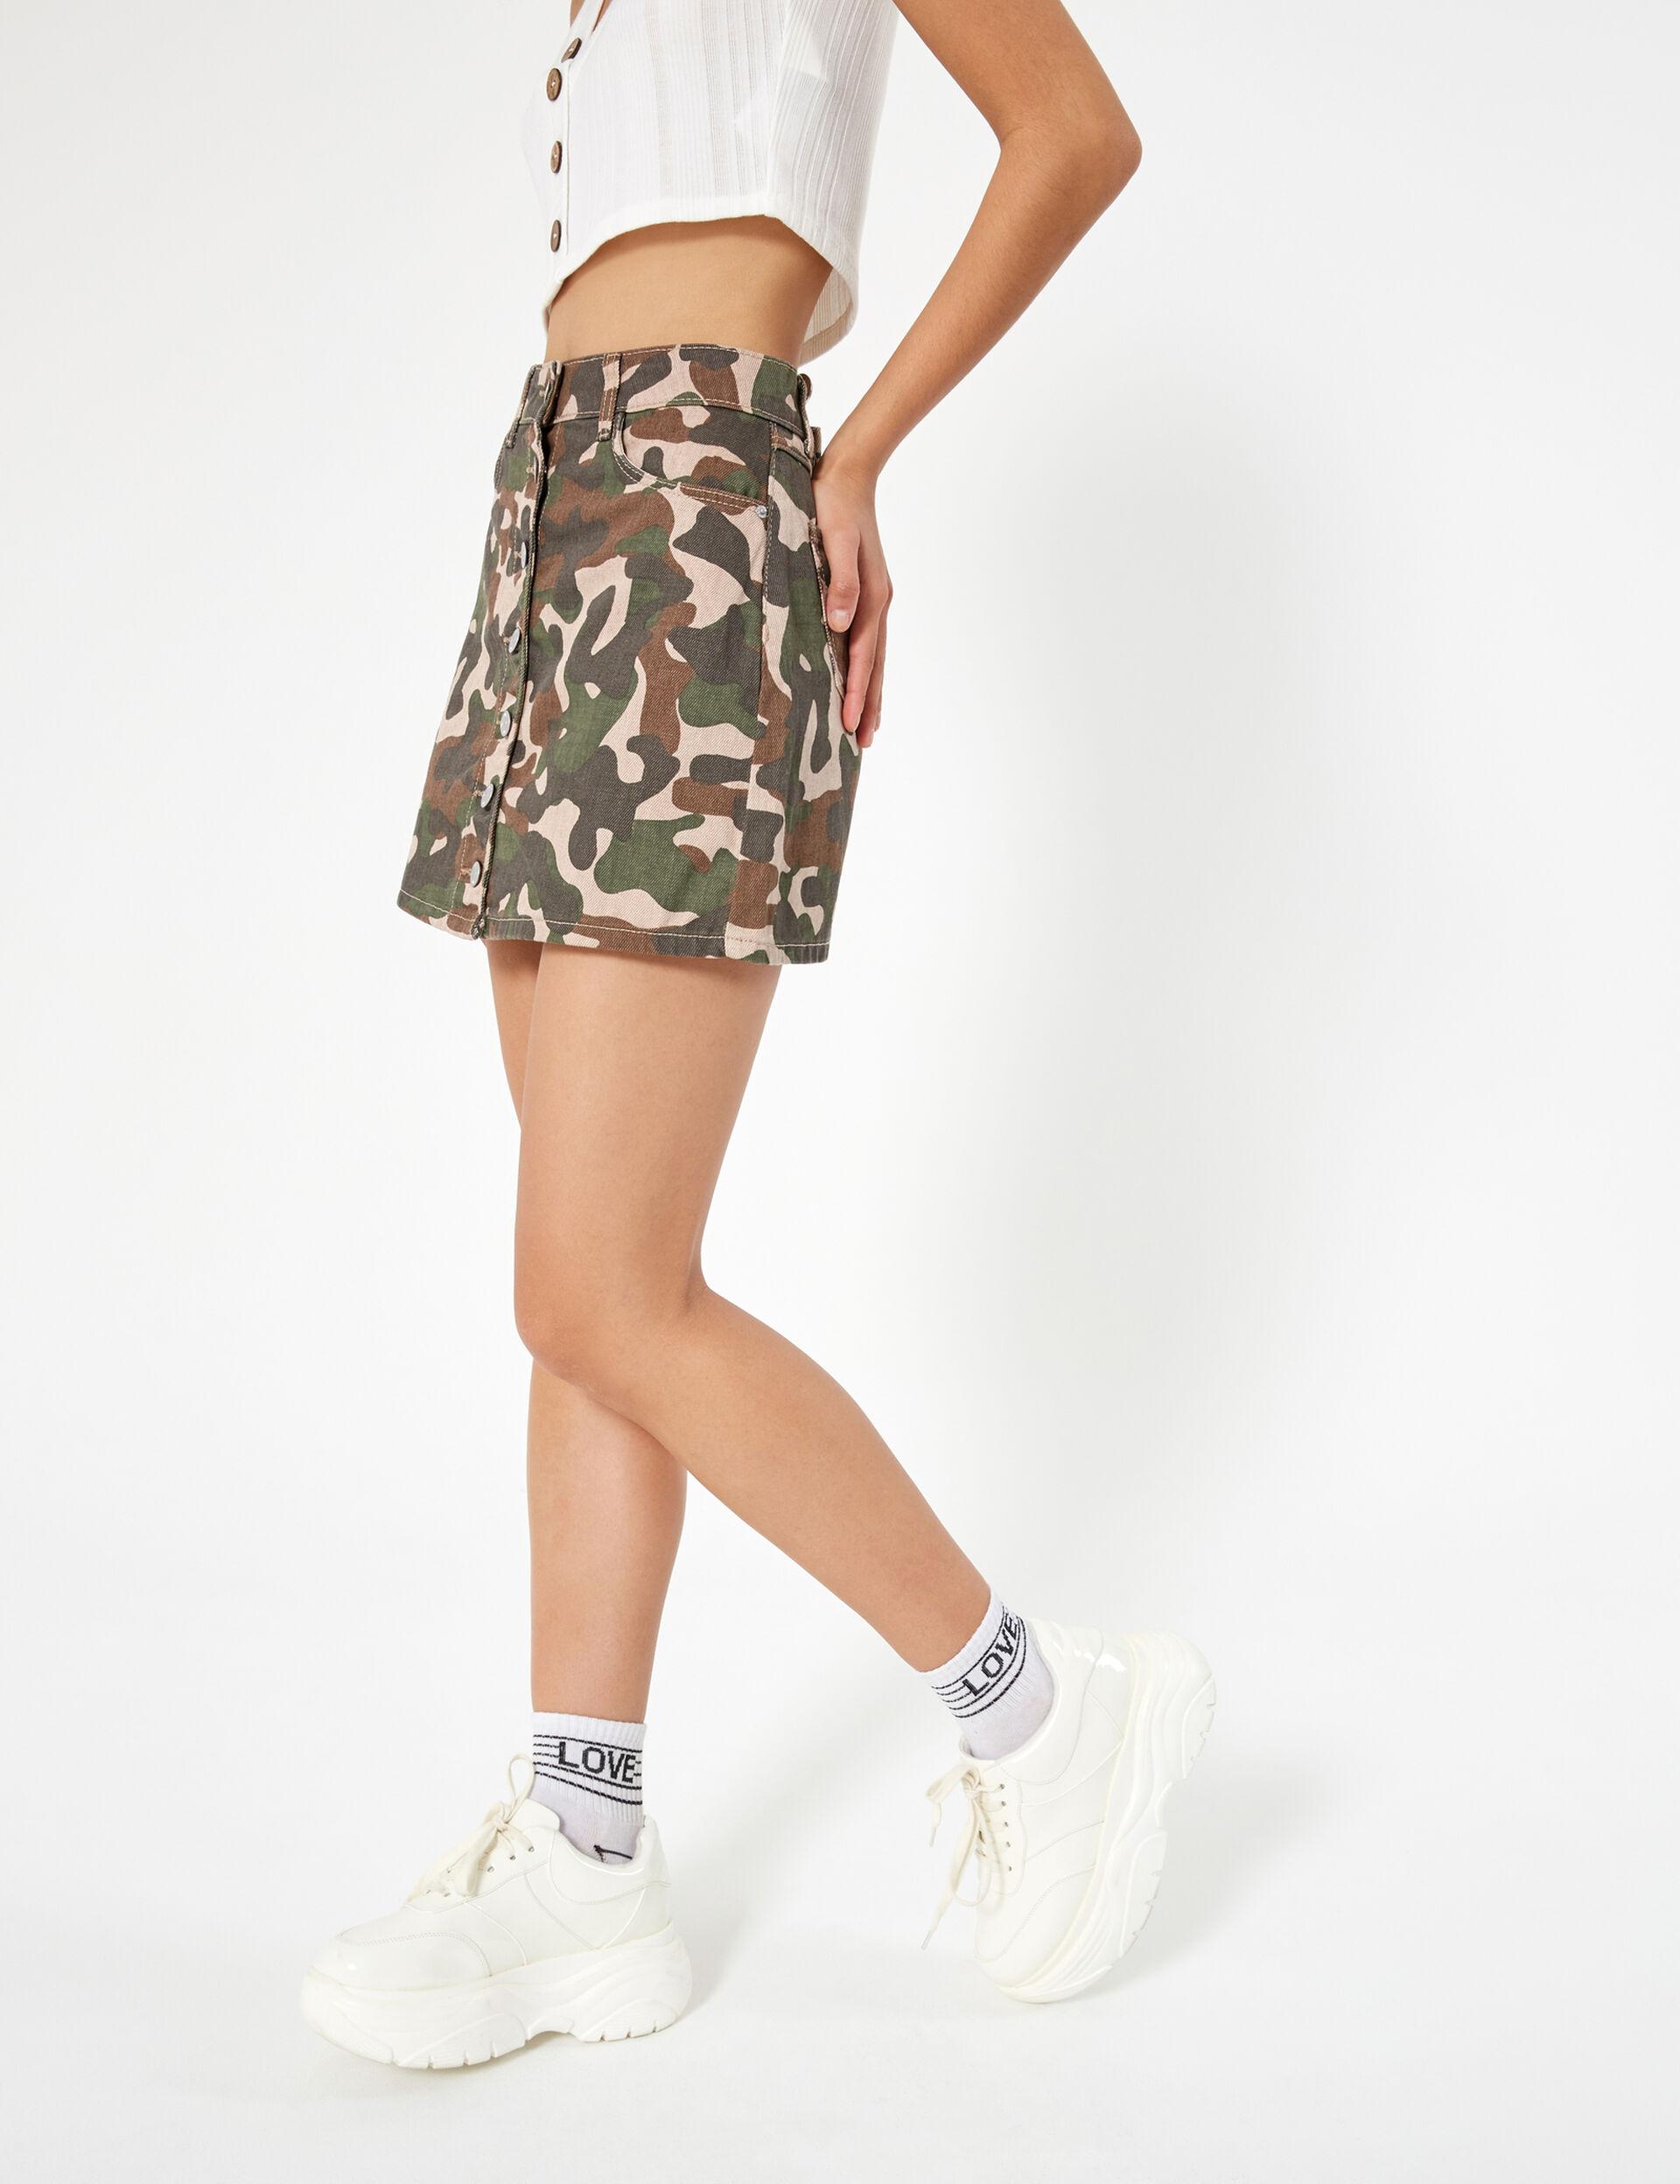 Jupe camouflage boutonnée kaki